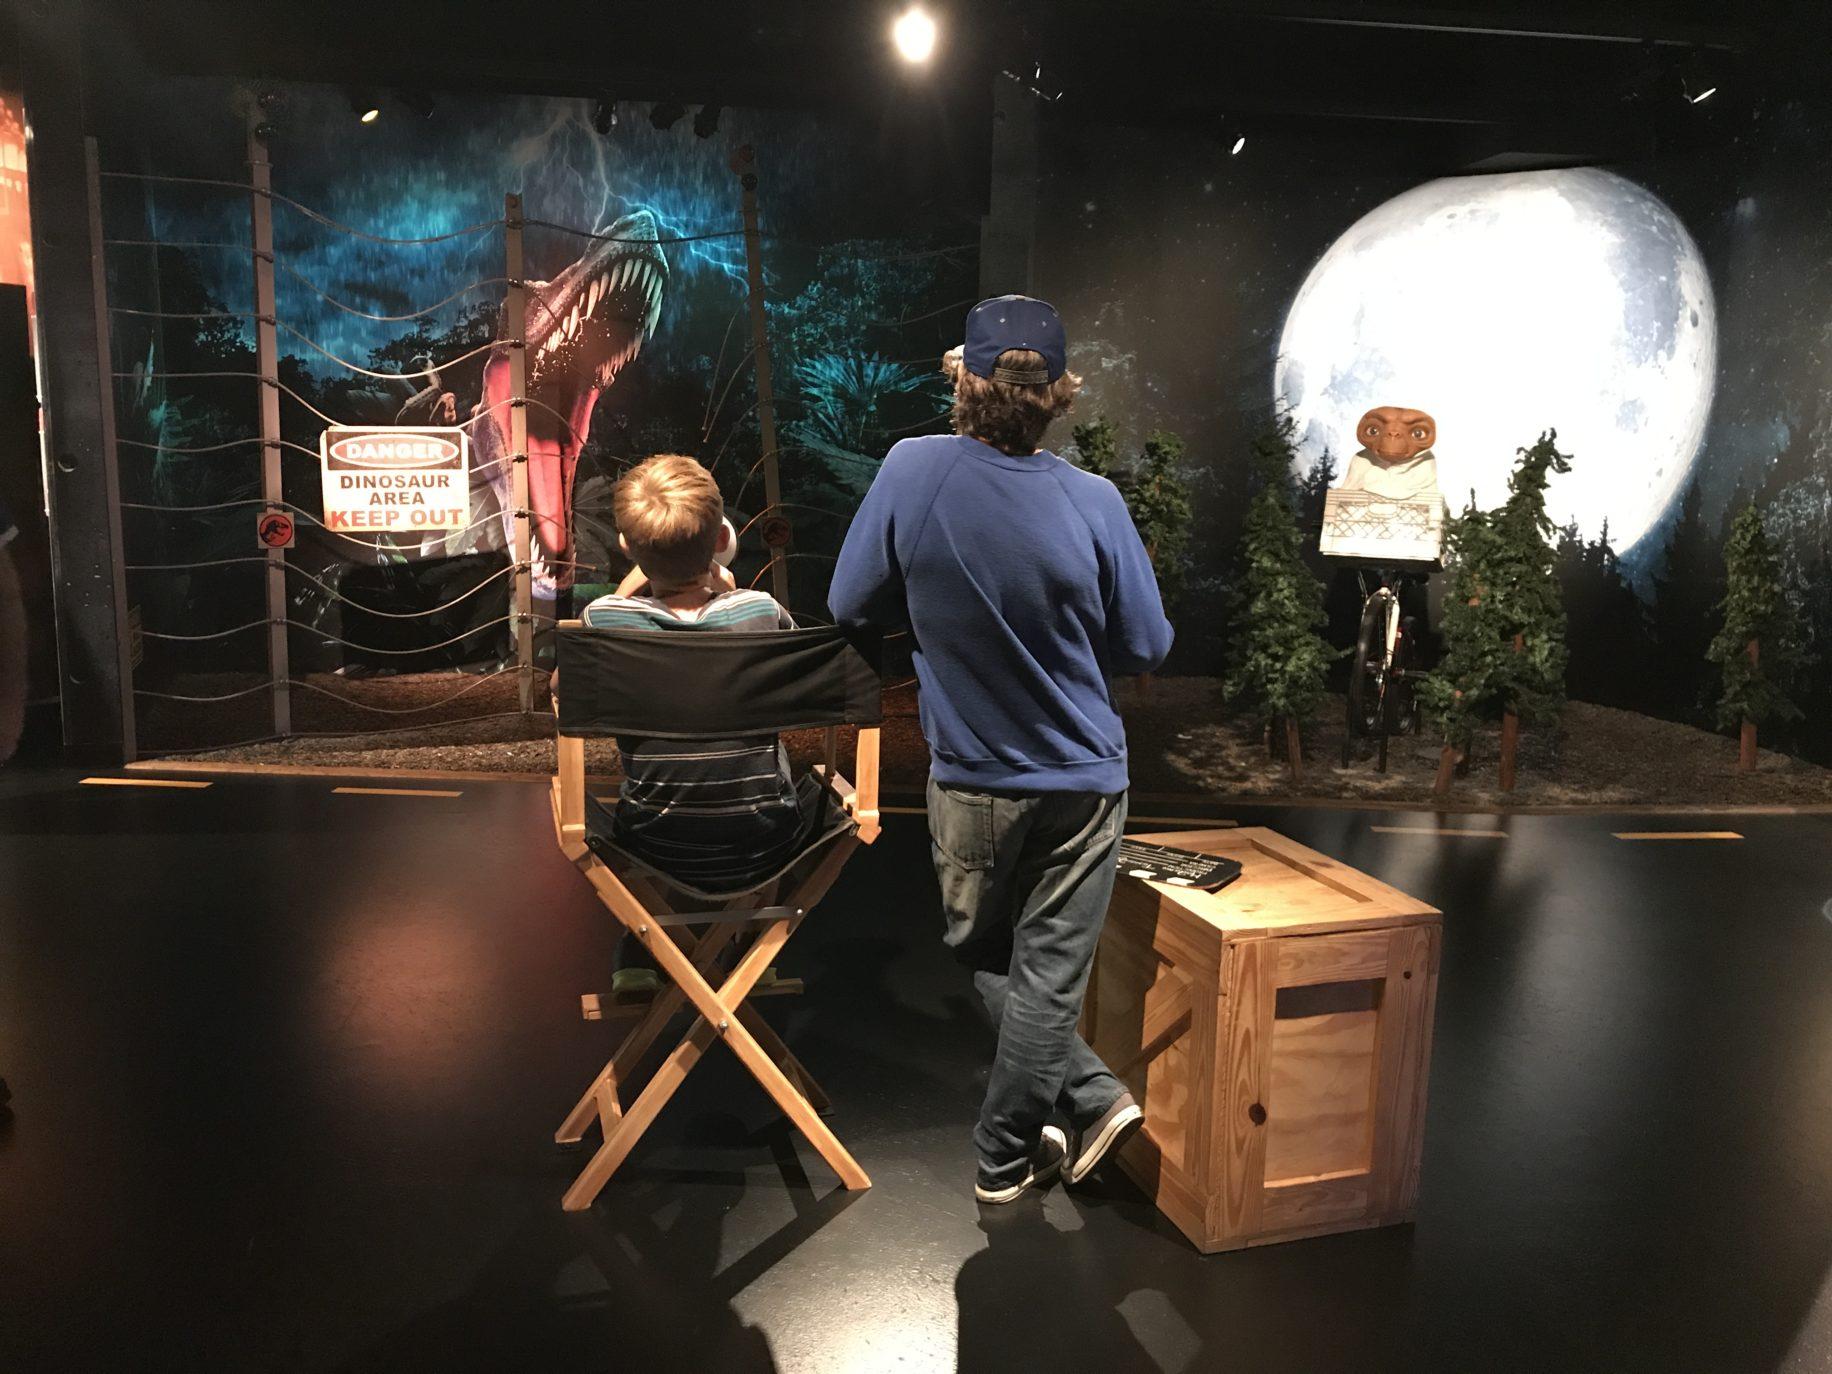 Sit in the directors chair. \ Image:a Dakster Sullivan